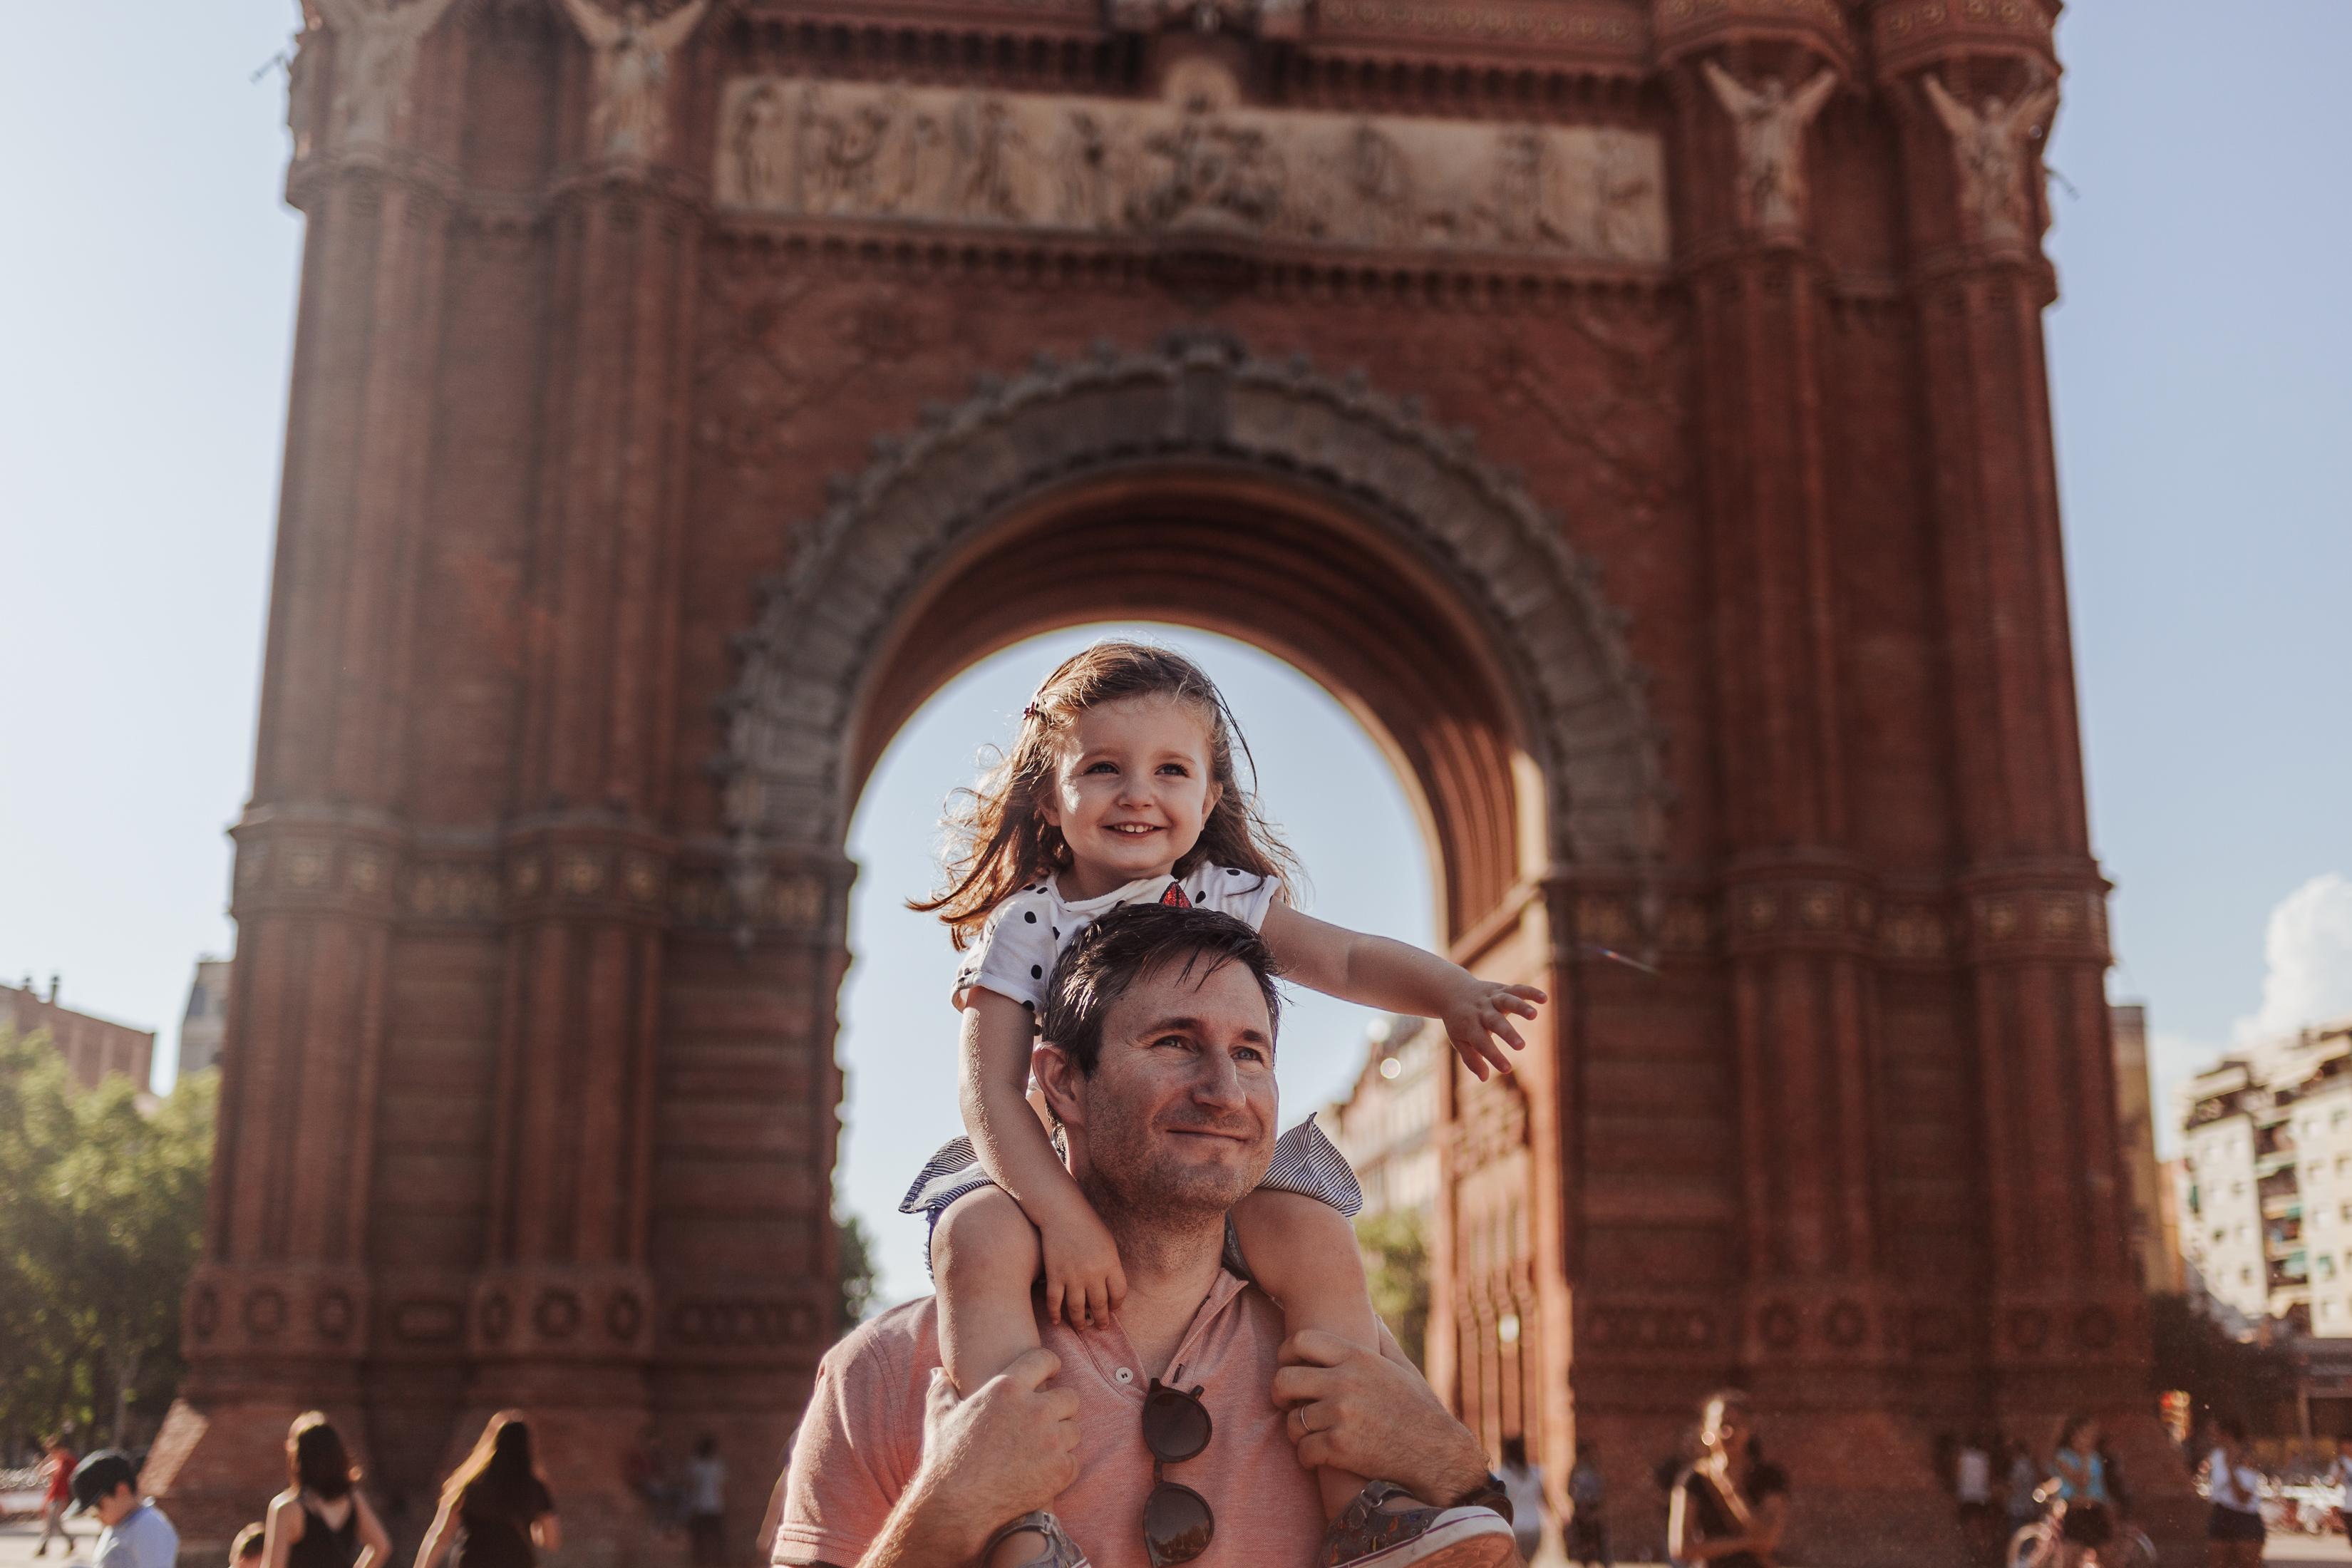 Fotógrafo de familia Barcelona :: Fotógrafo familiar Barcelona :: Arco del triunfo :: Parc de la Ciutadella :: Parque de la Ciudadela :: Barcelona photographer :: Family Barcelona Photographer